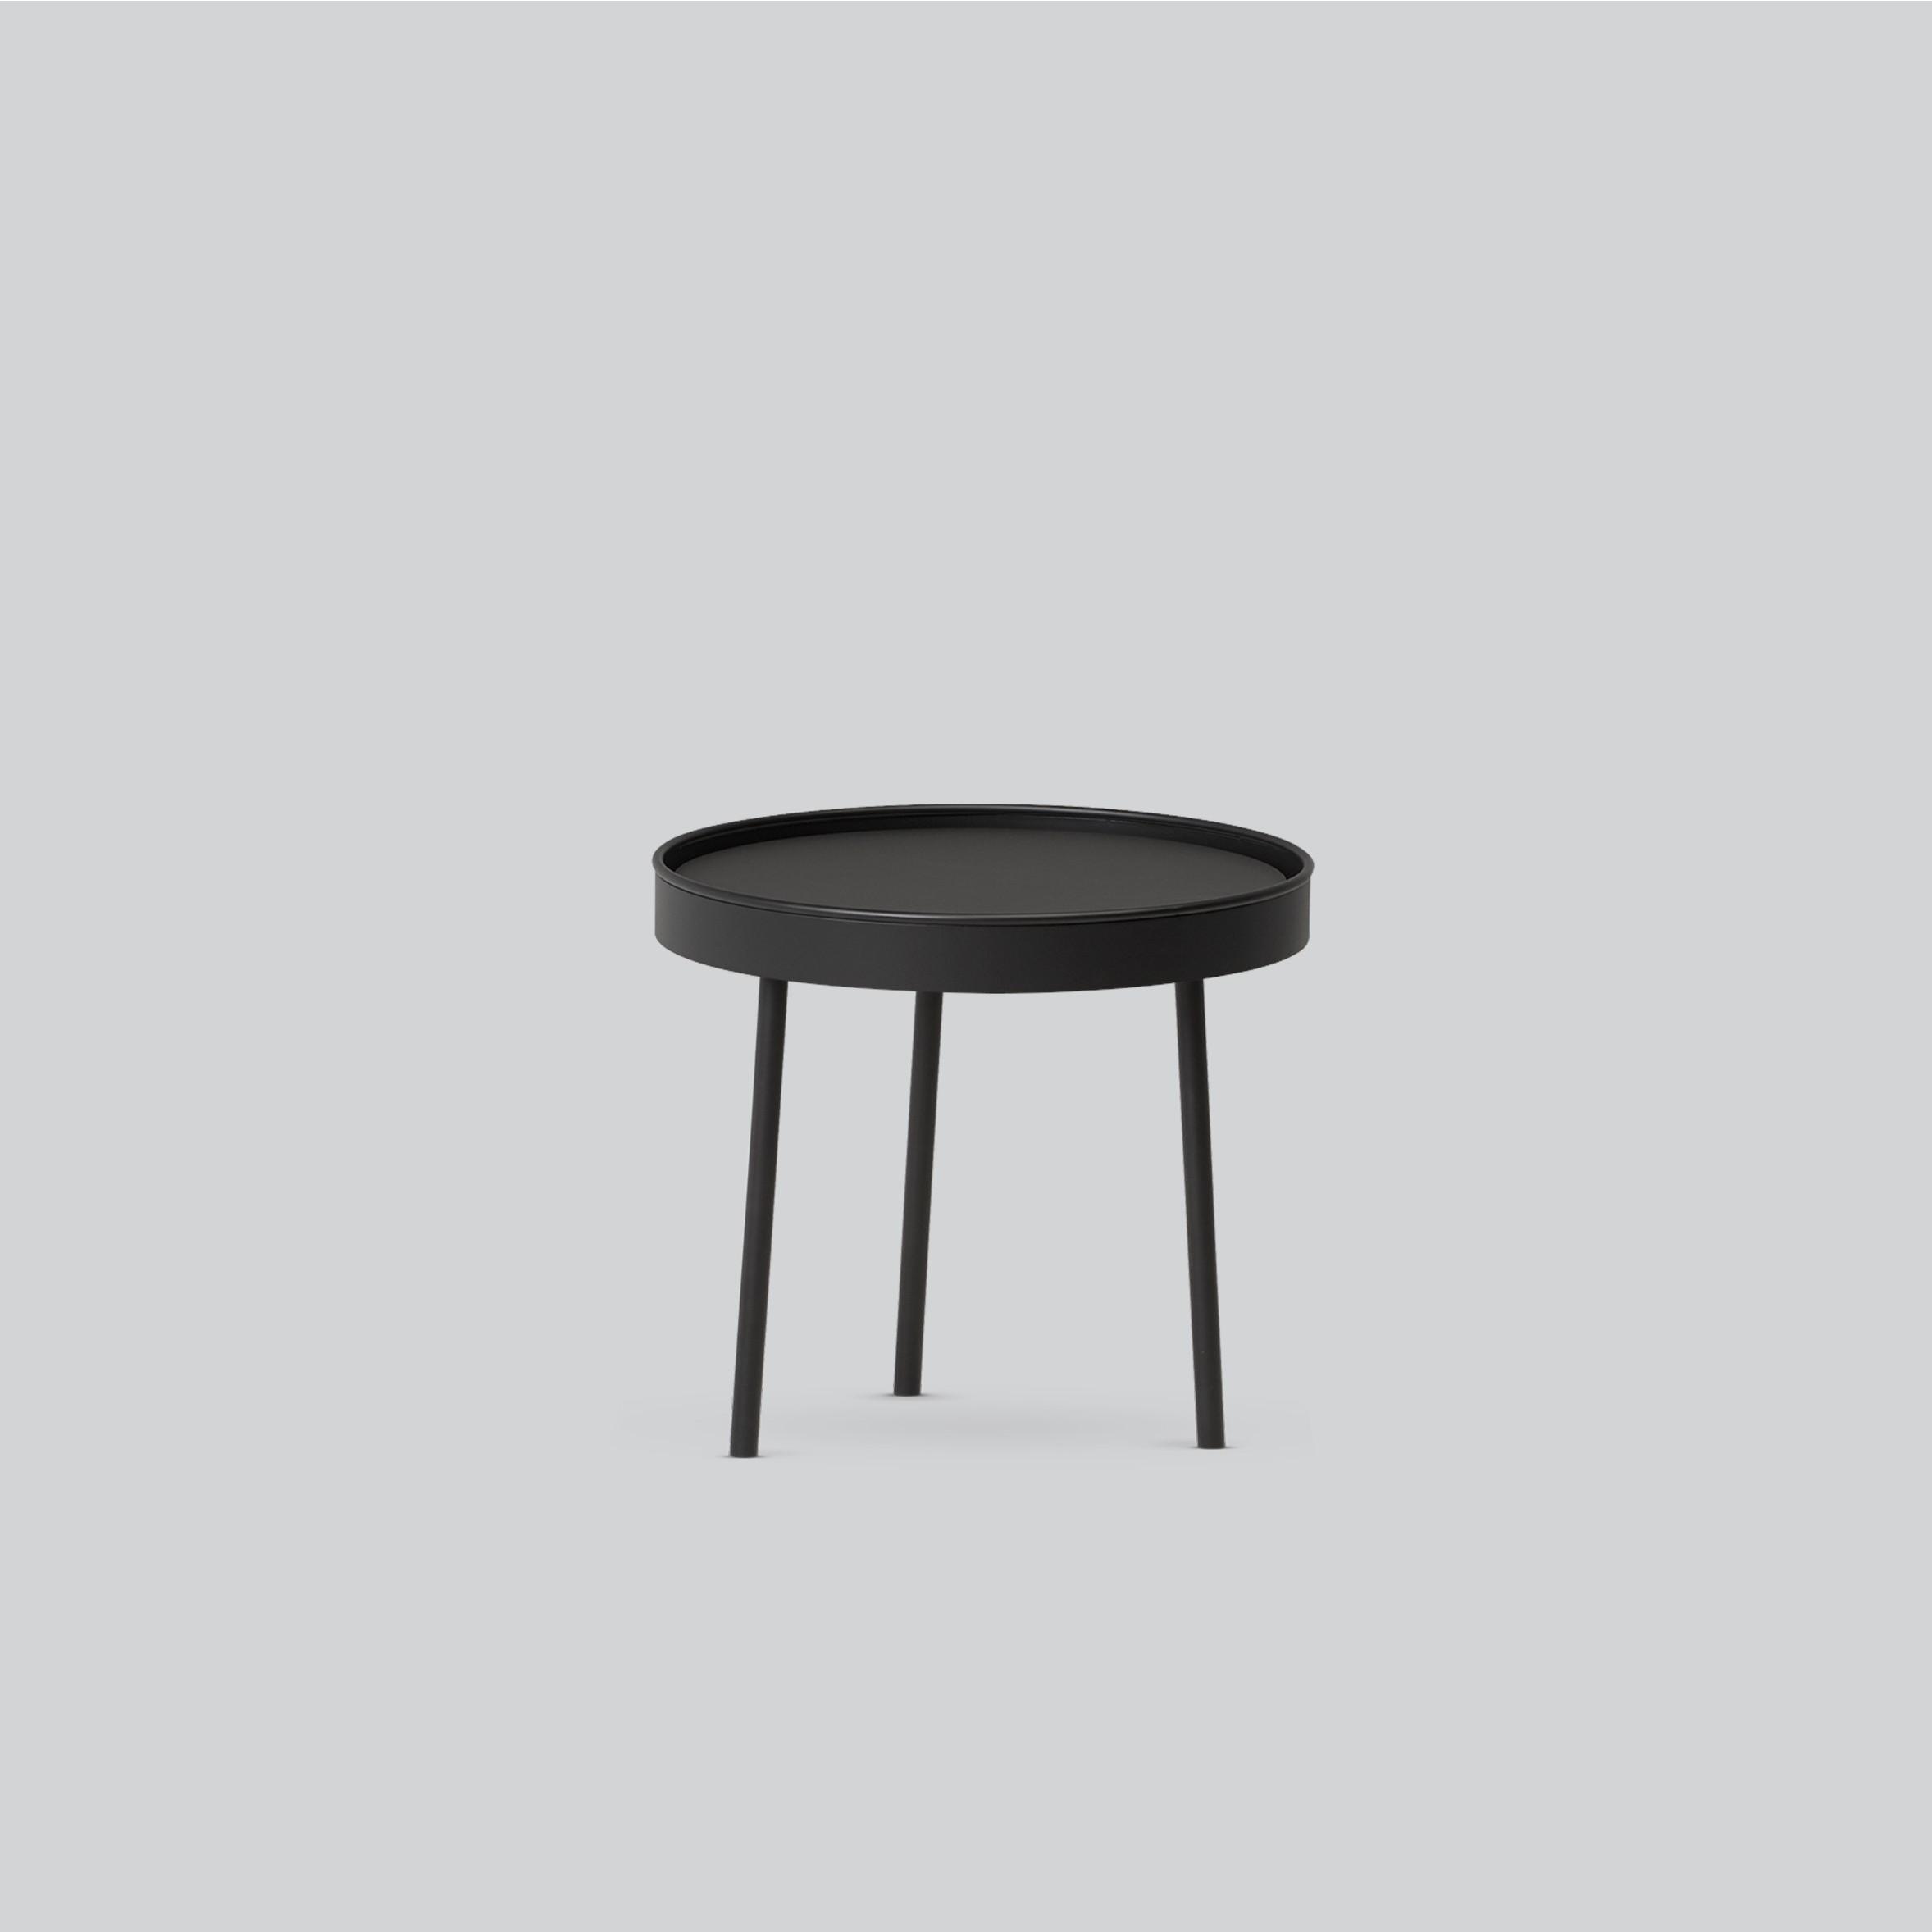 Coffee Table Stilk Small | Black